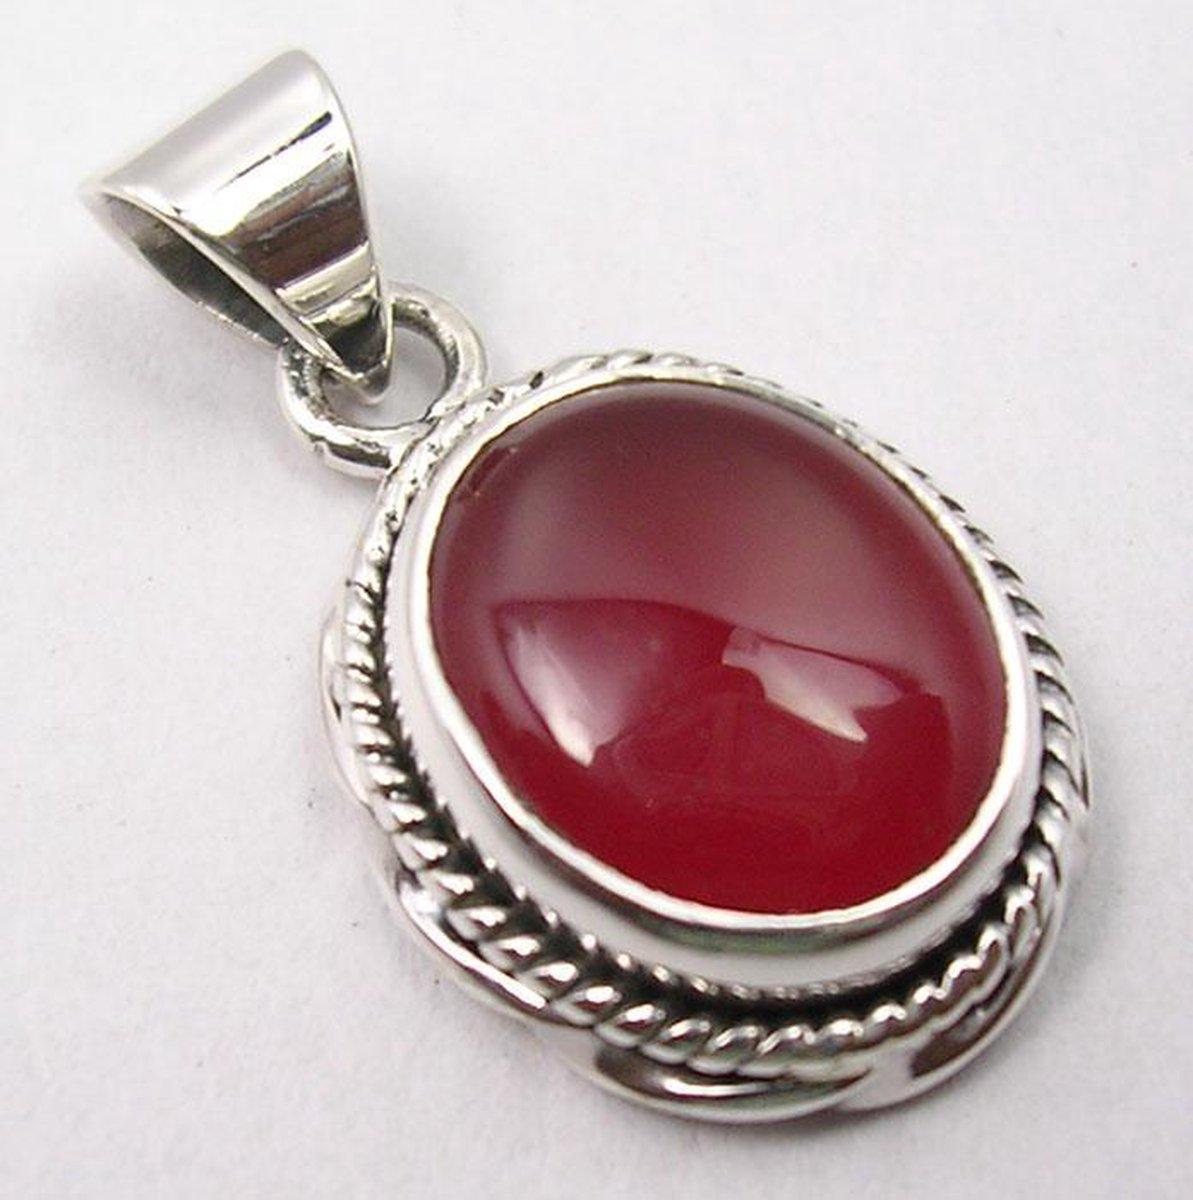 Natuursieraad -  925 sterling zilver boho rood carneool ketting hanger - luxe edelsteen sieraad - handgemaakt - Terra Edela